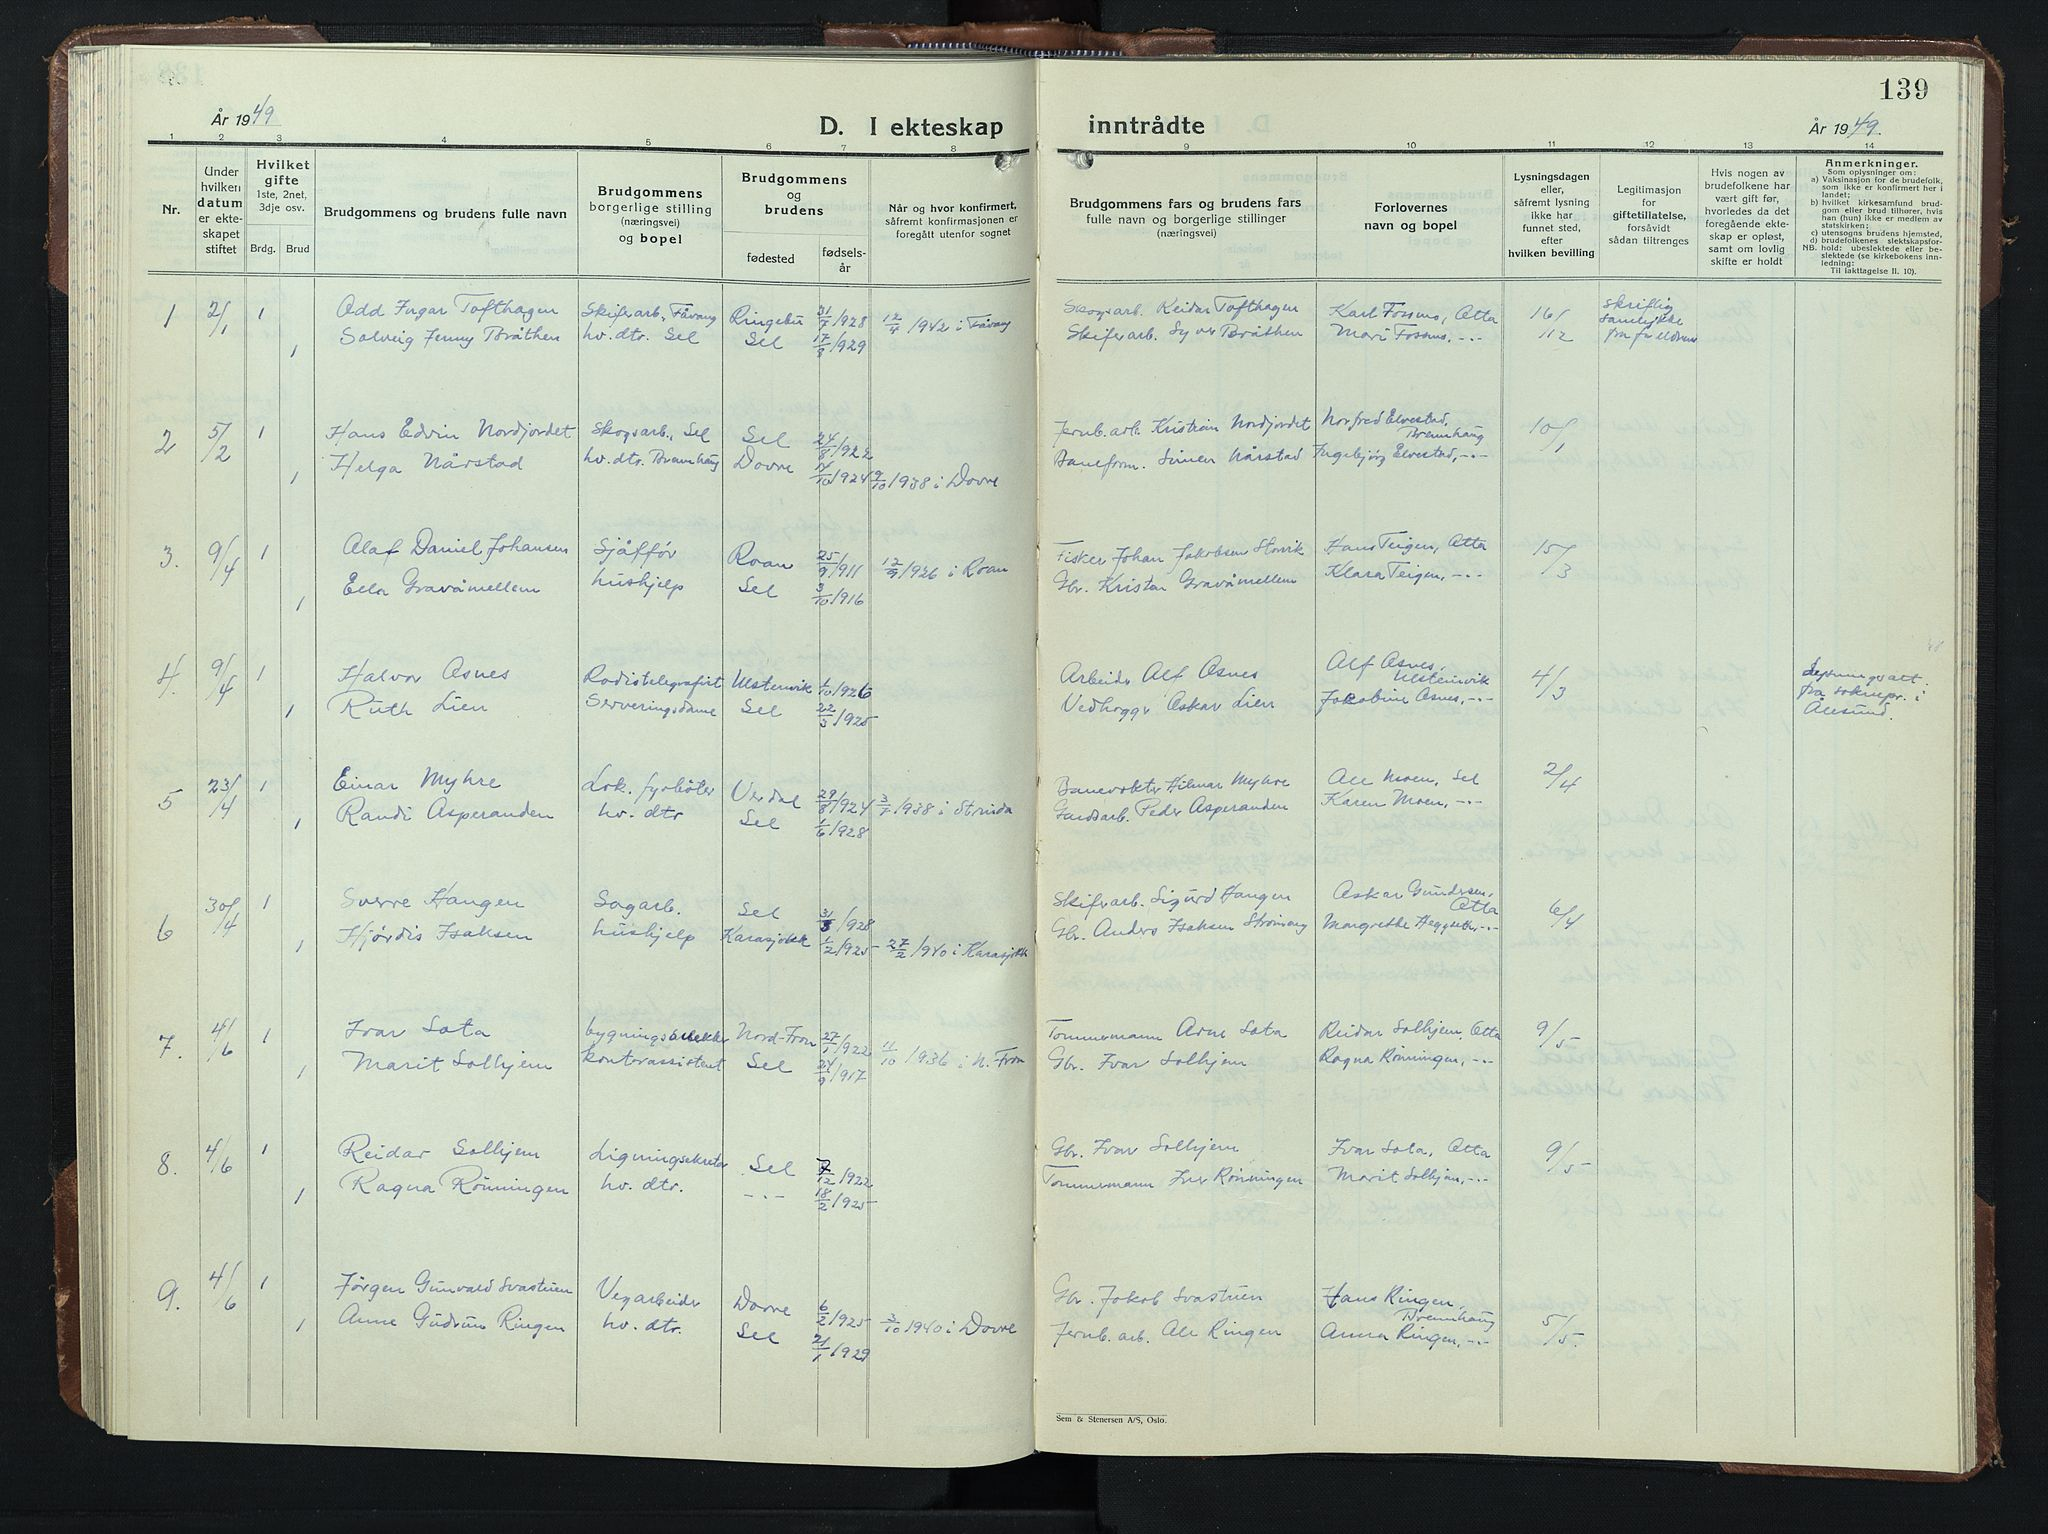 SAH, Sel prestekontor, Klokkerbok nr. 3, 1940-1951, s. 139